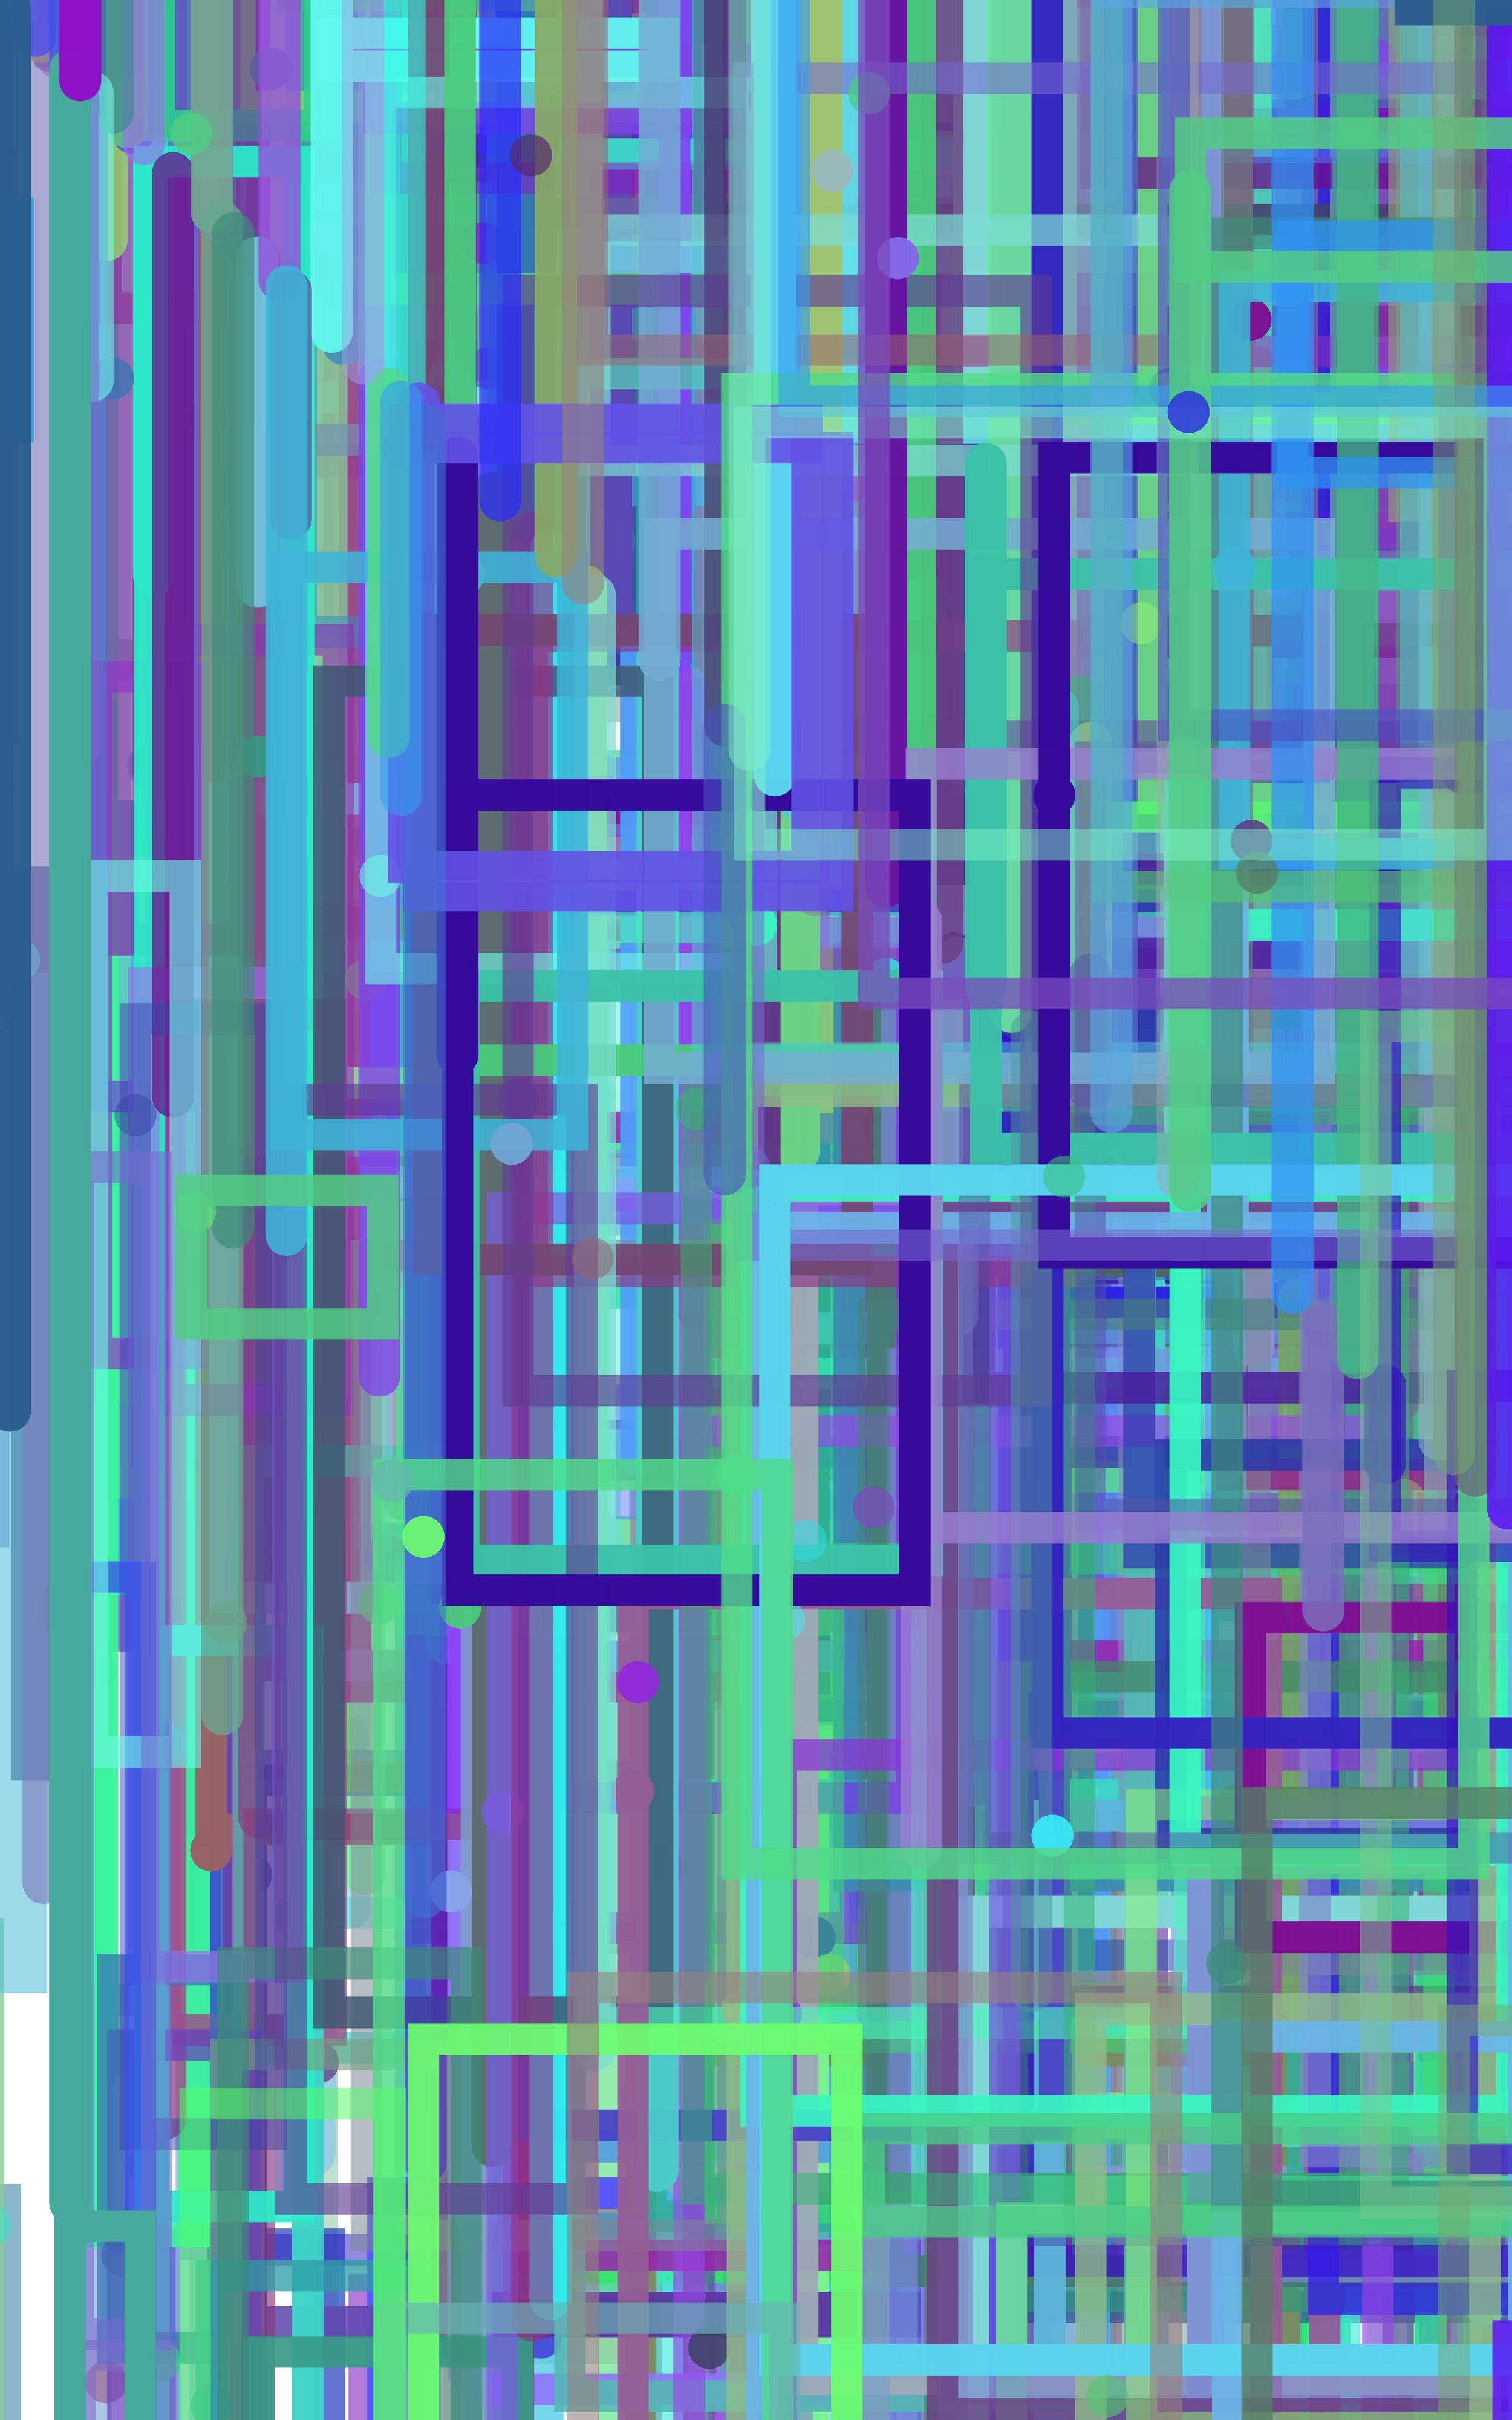 Processing(2).jpg